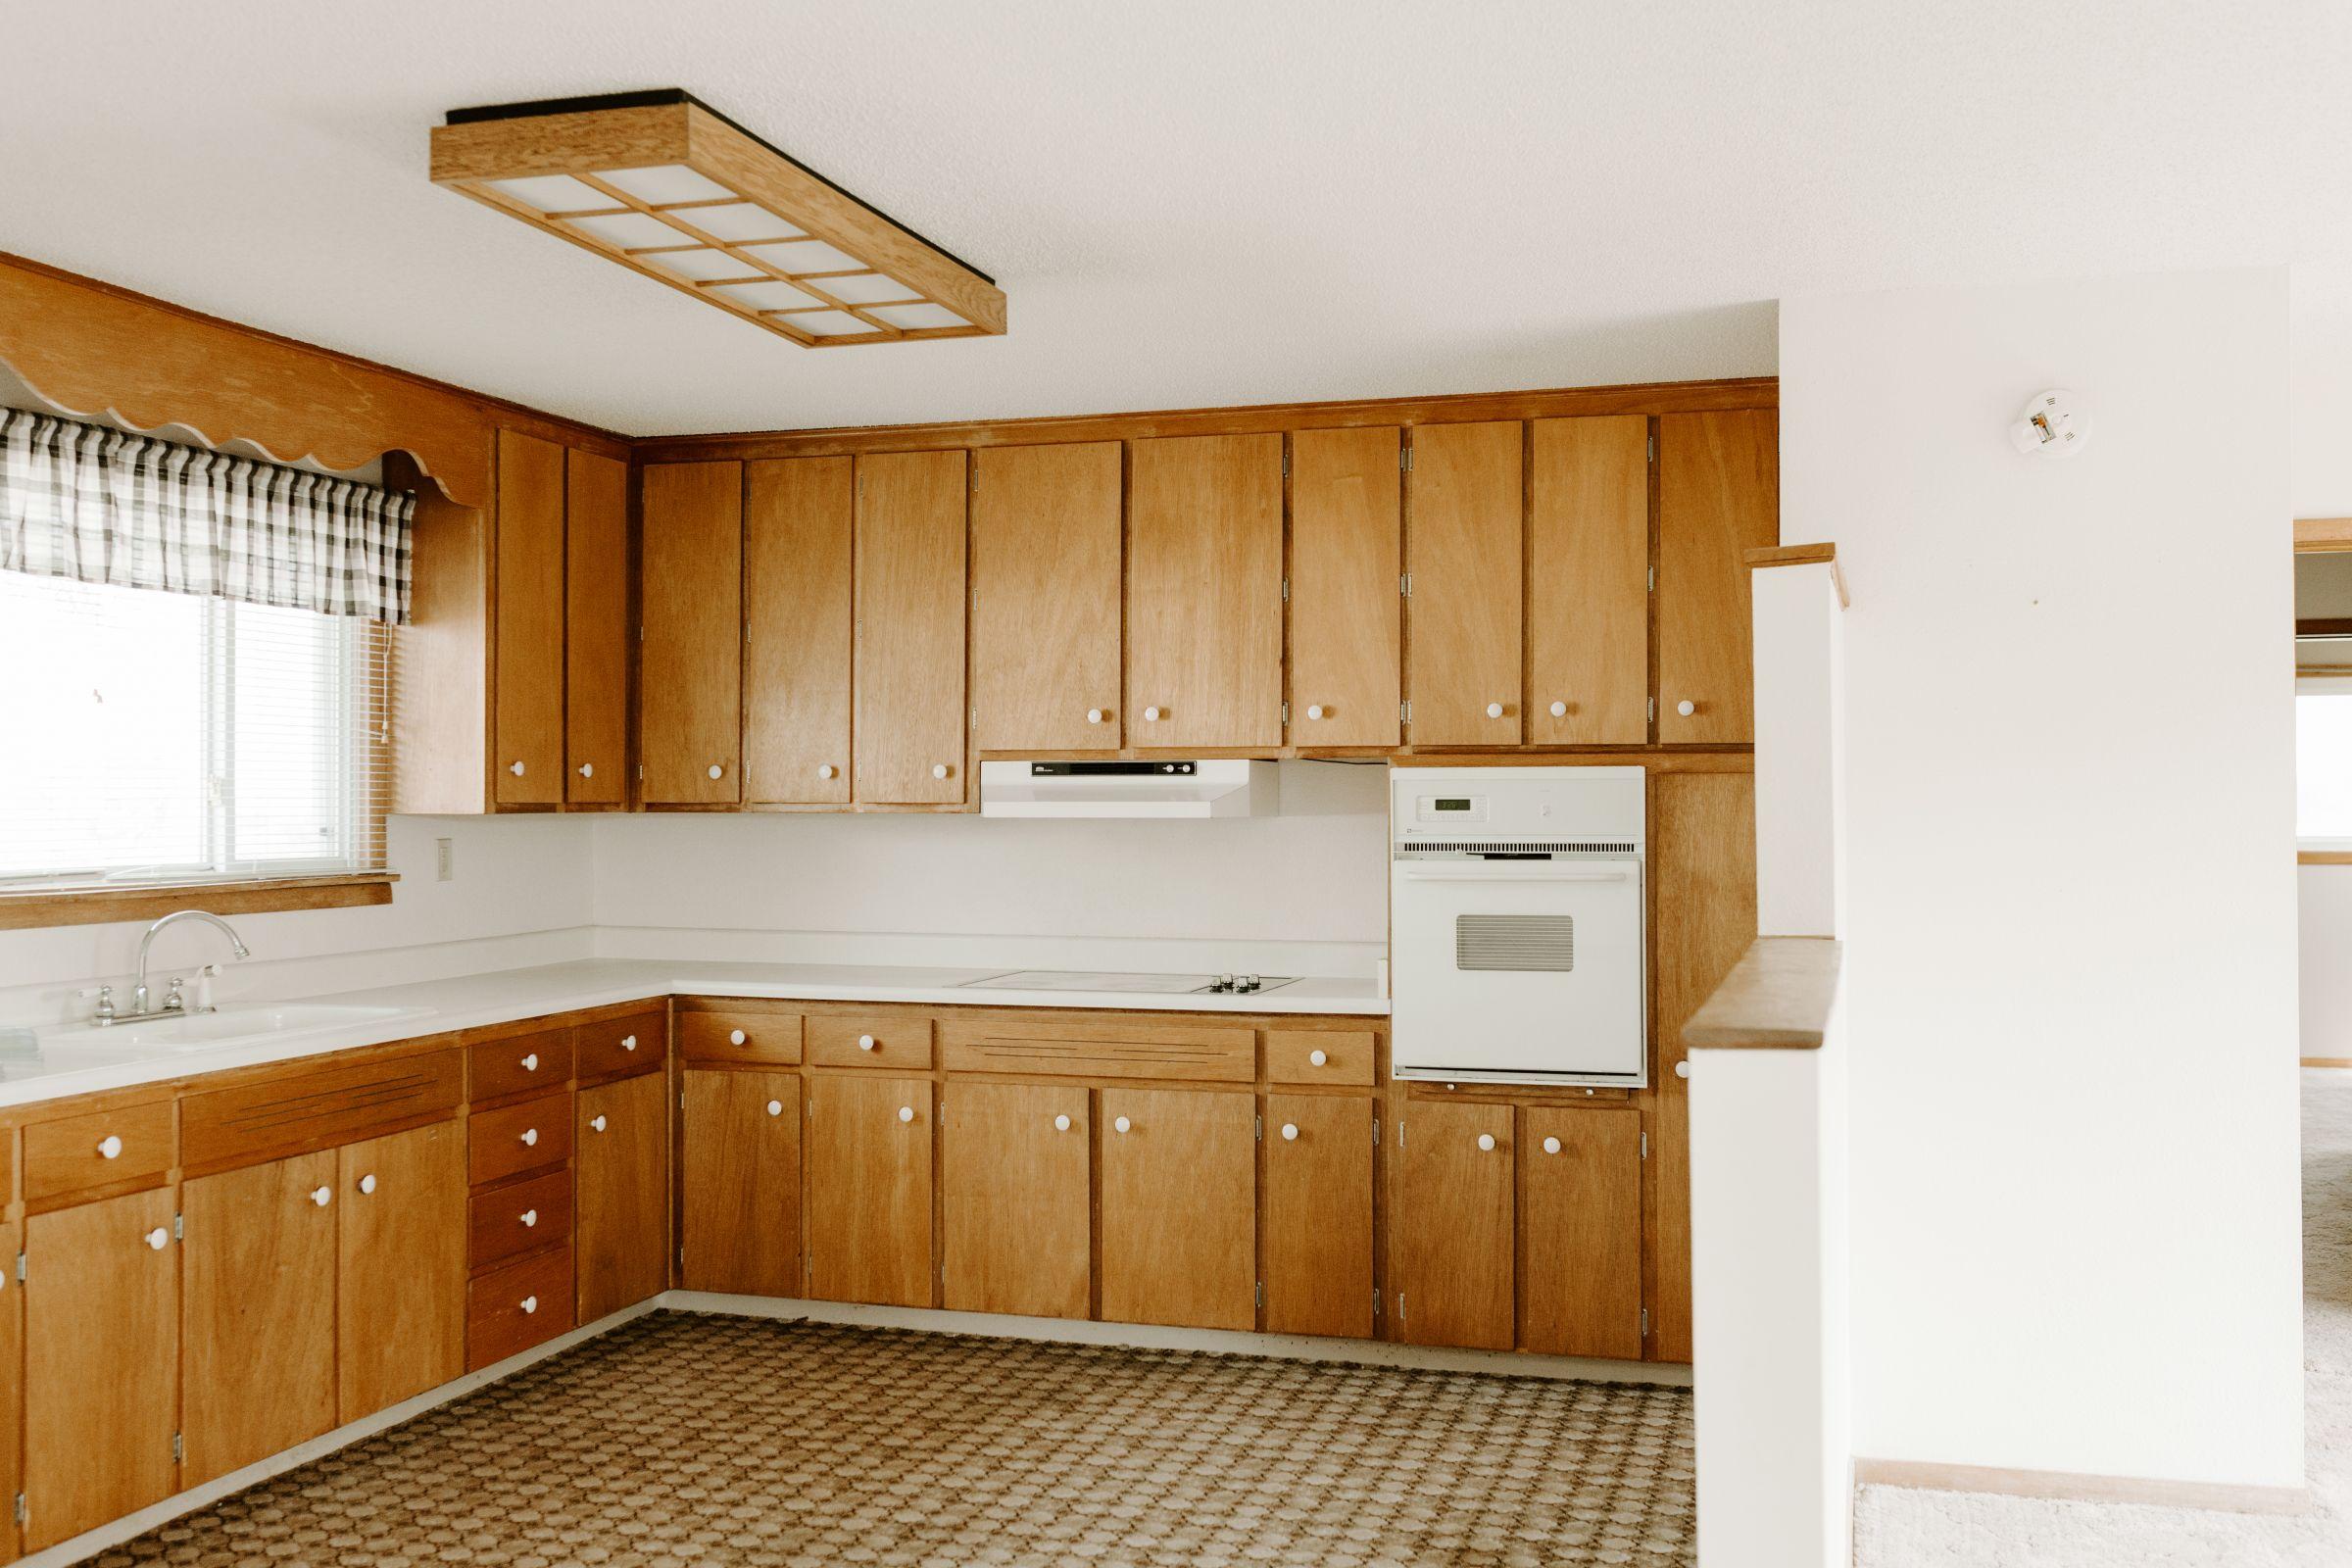 residential-warren-county-iowa-2-acres-listing-number-15743-3-2021-09-15-193735.jpg